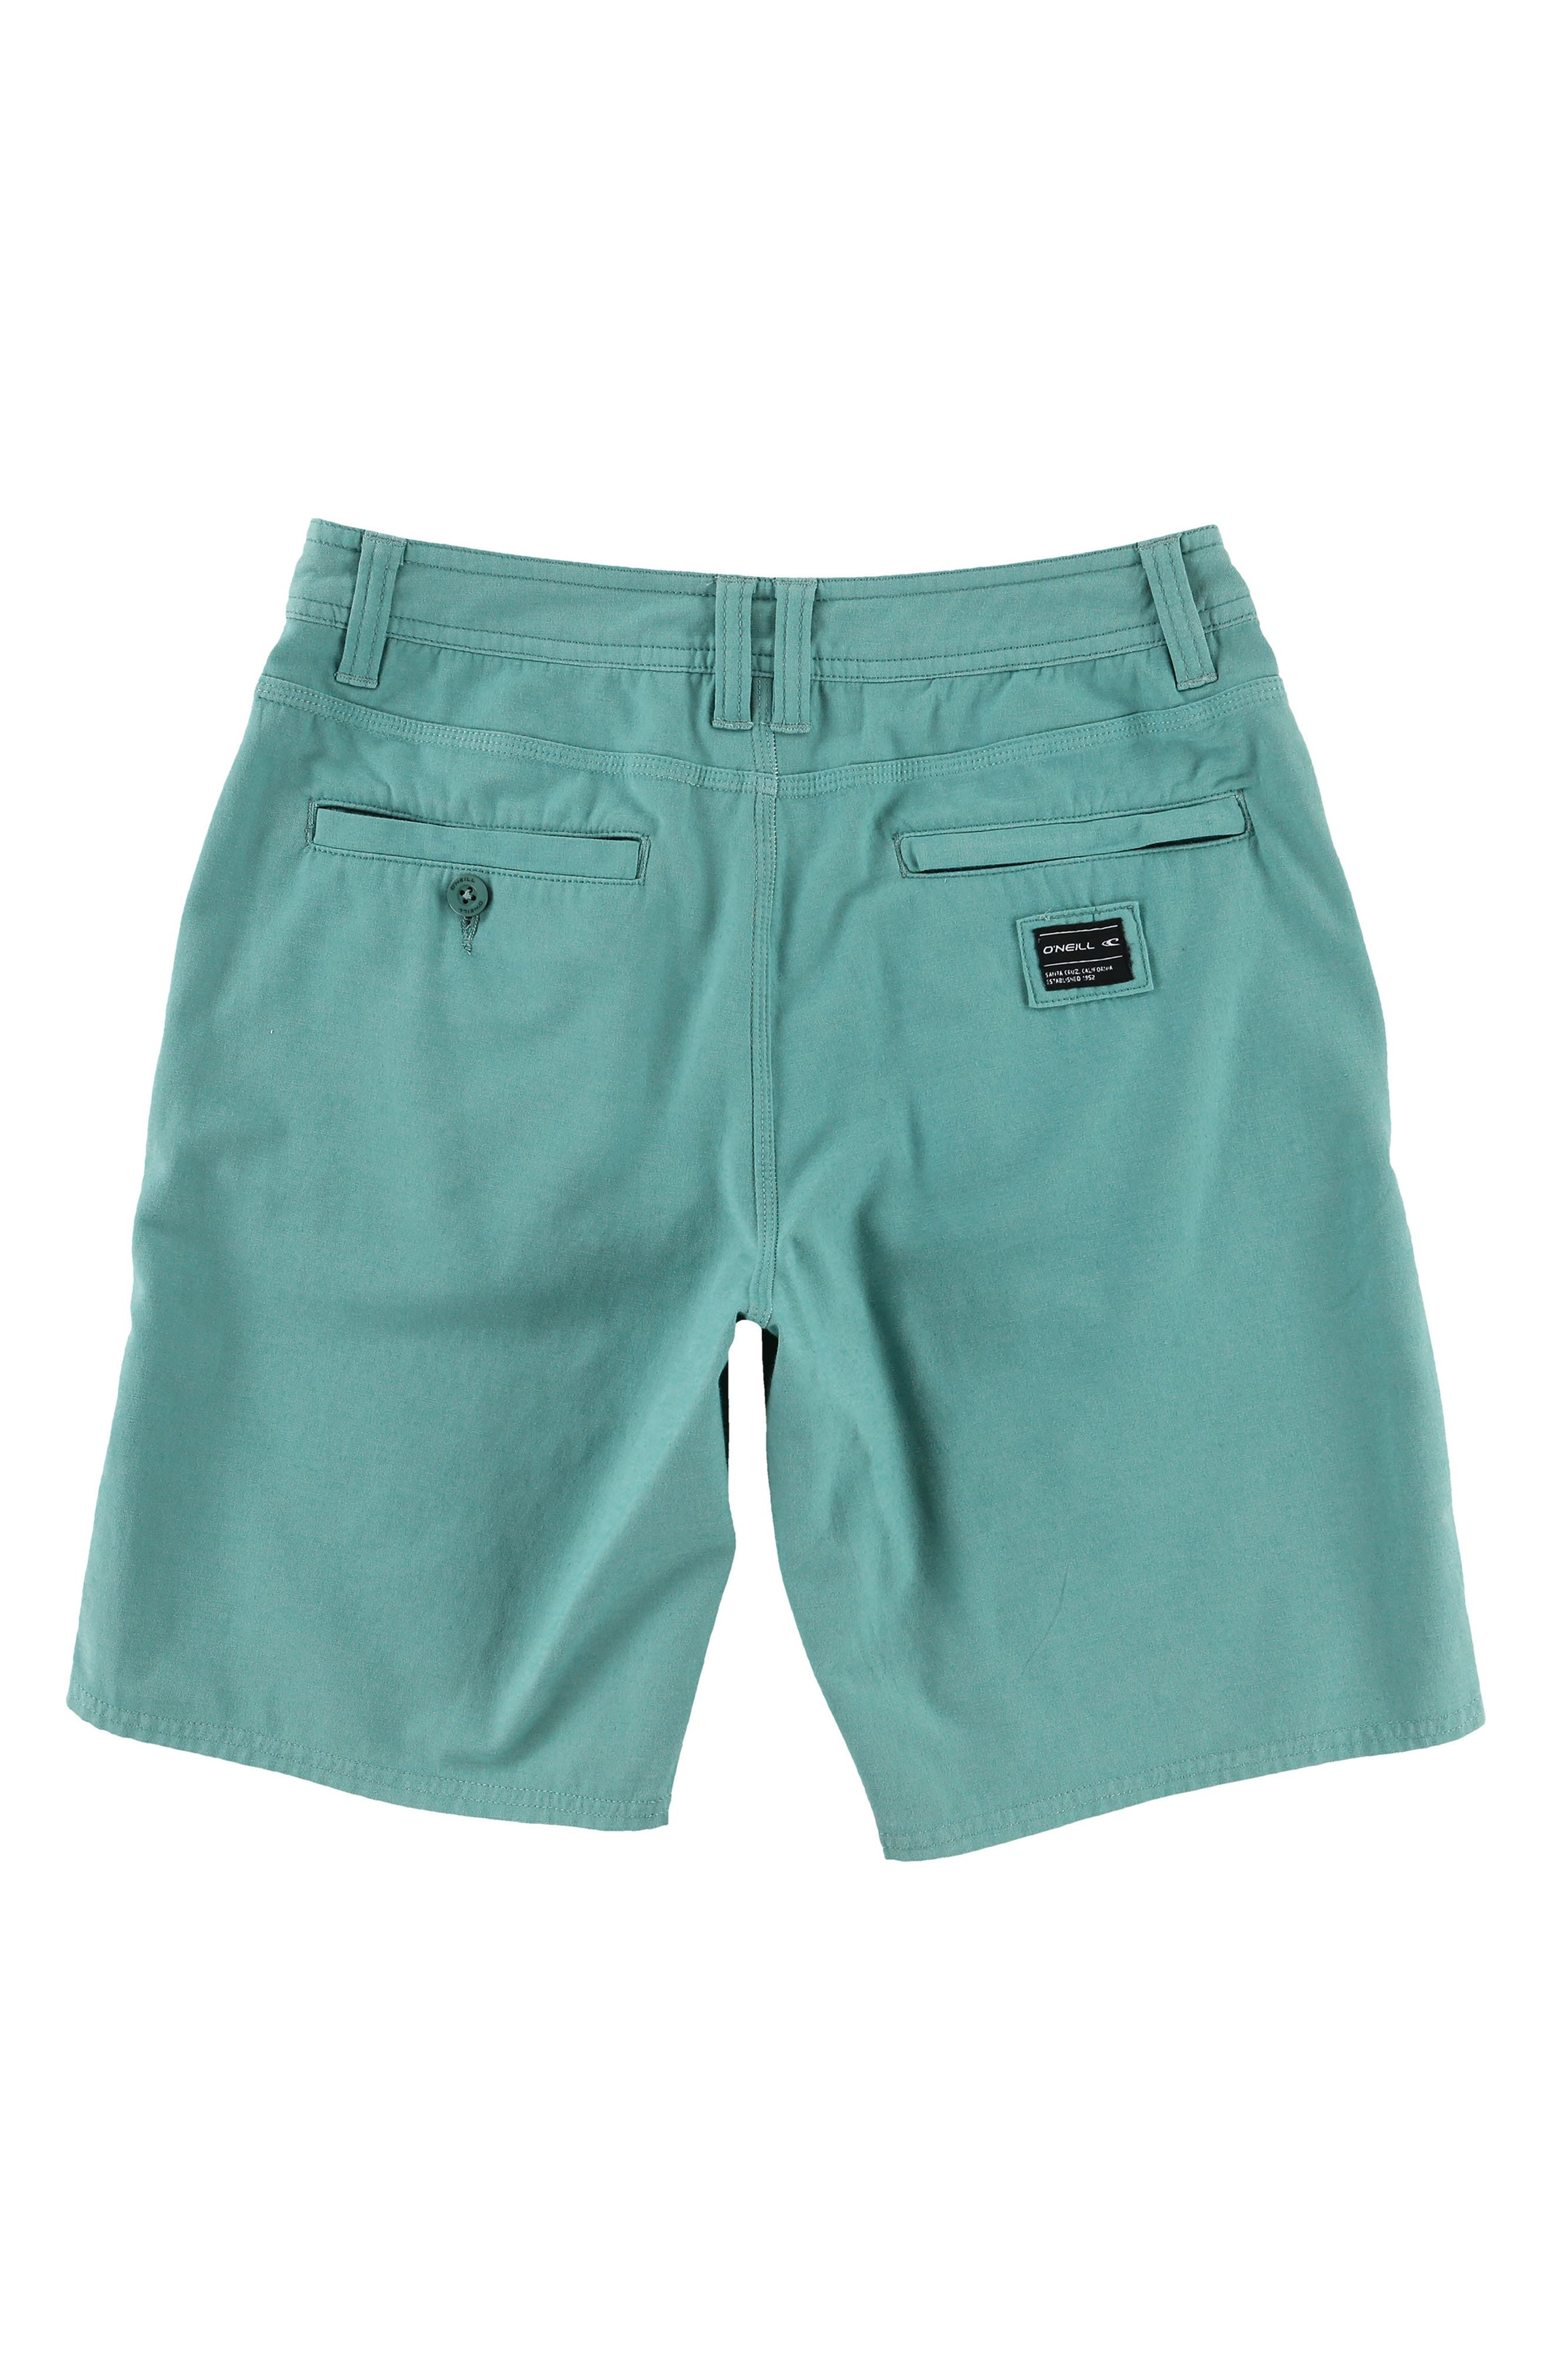 Locked Overdye Hybrid Shorts,                             Alternate thumbnail 4, color,